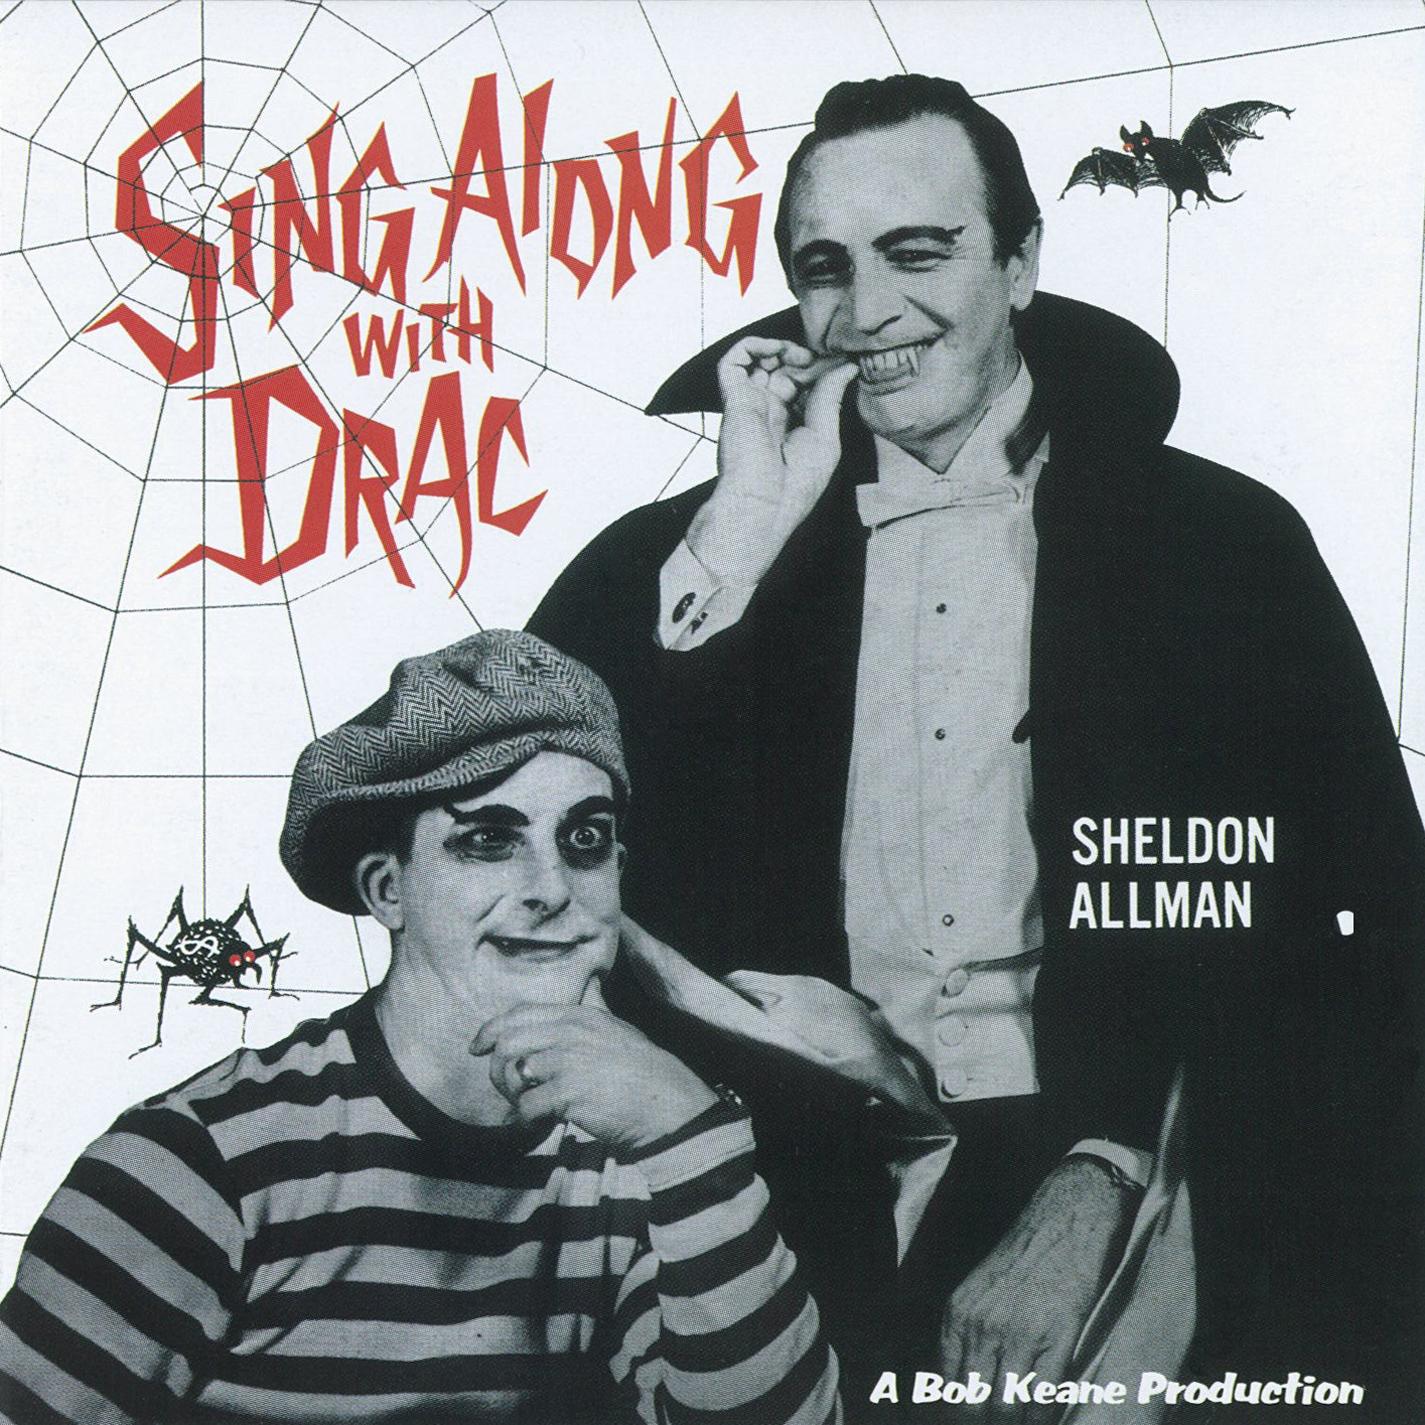 Sheldon Allman Sheldon Allman new pictures